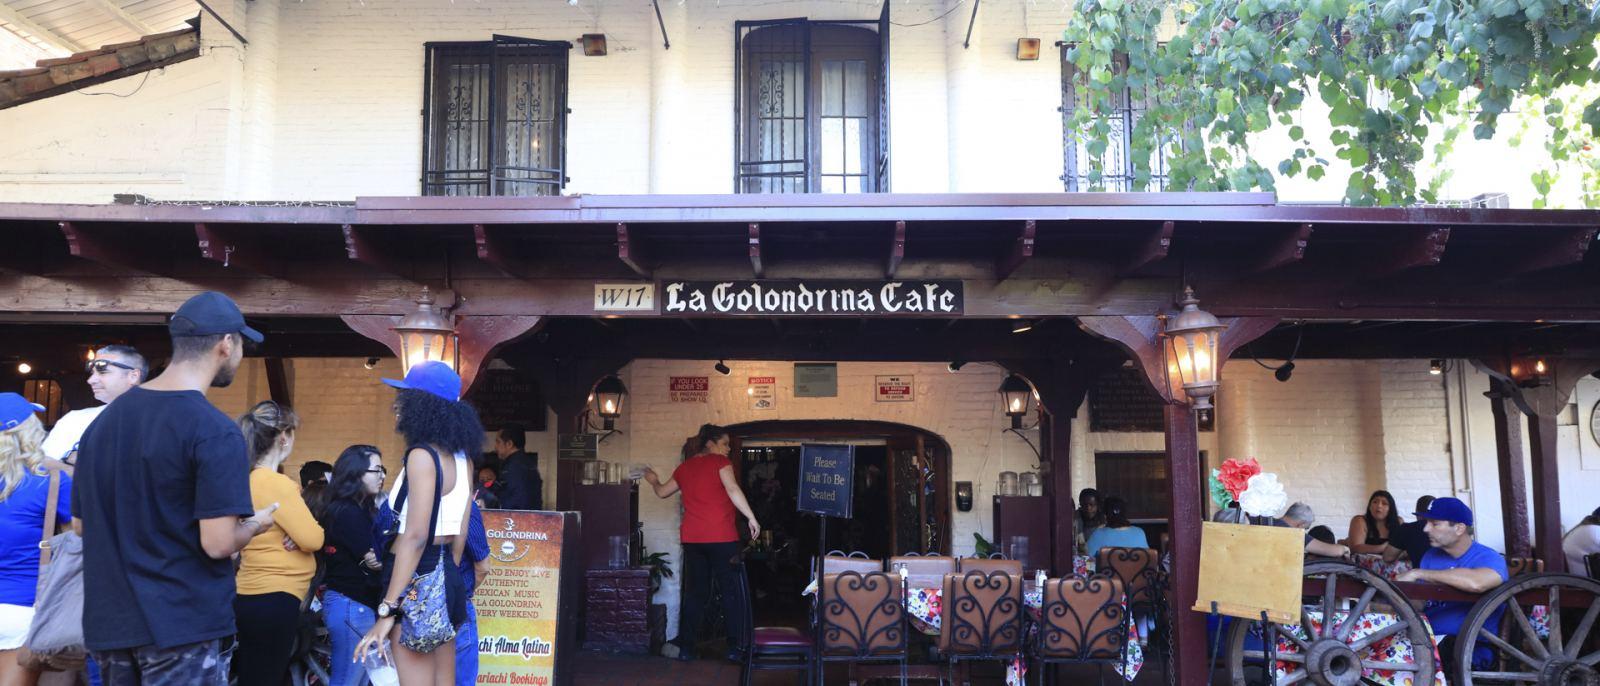 La Golondrina Cafe Olvera Street